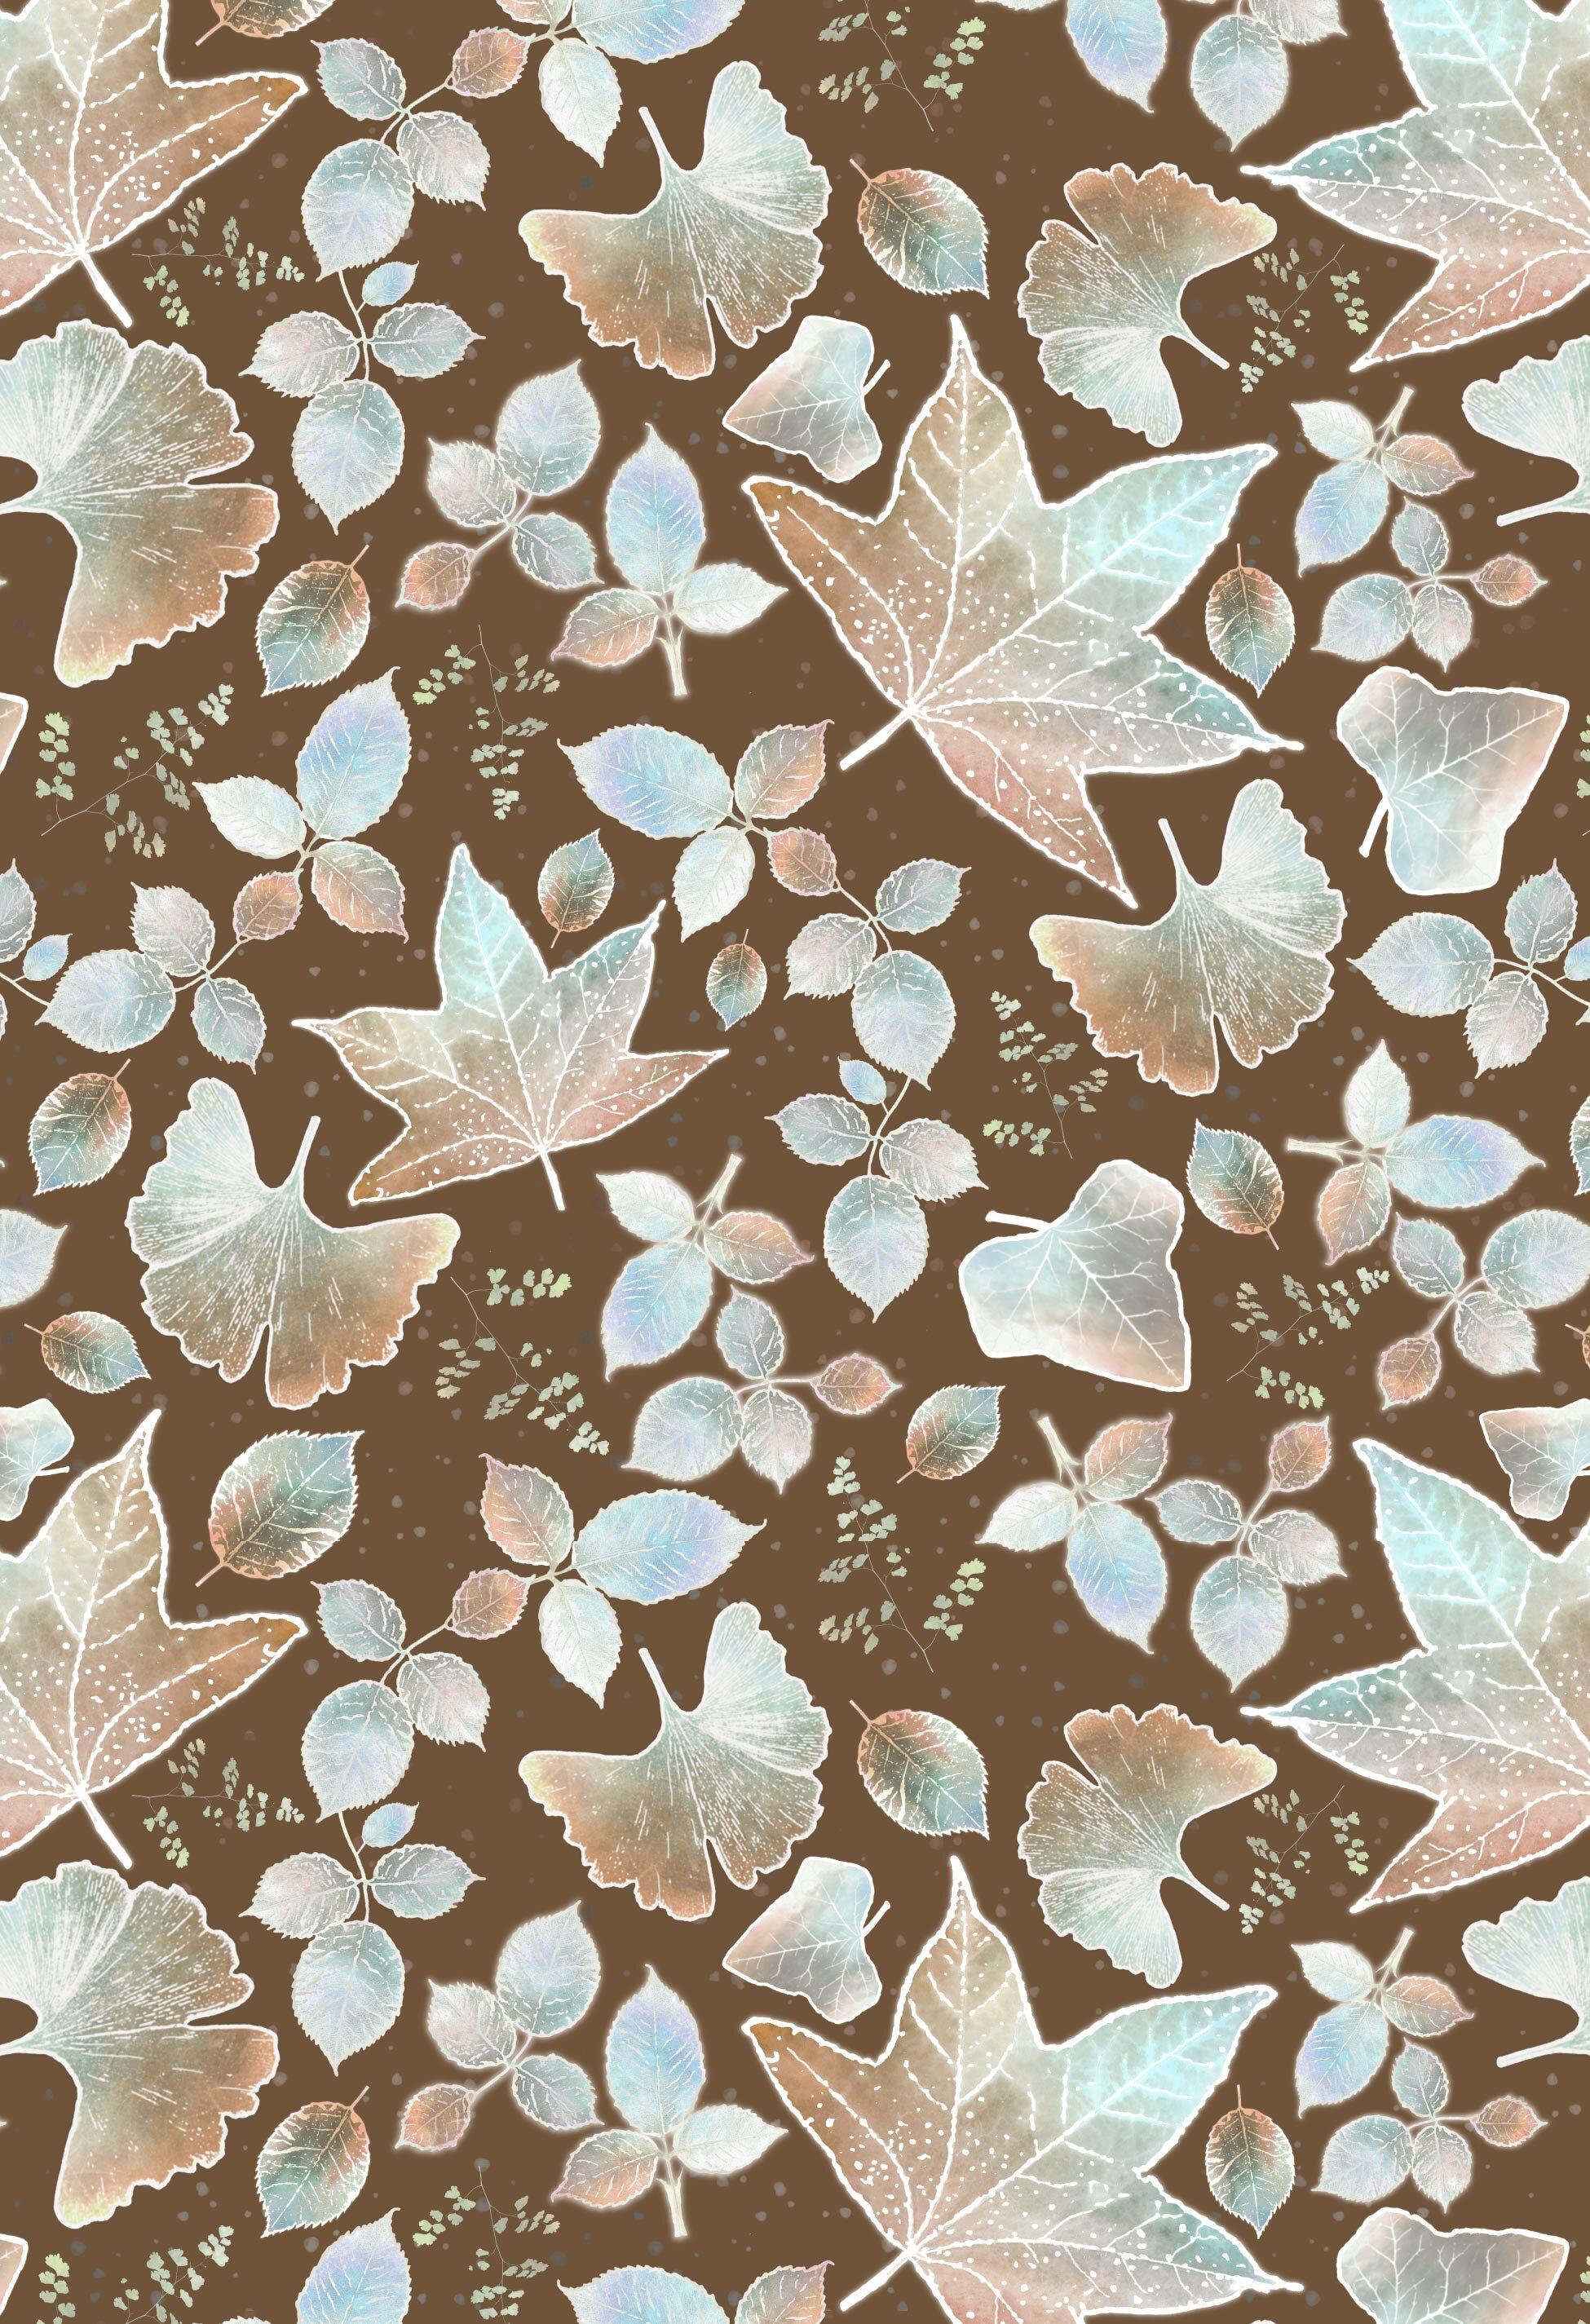 Large leaves allover mint latte brown background.jpg